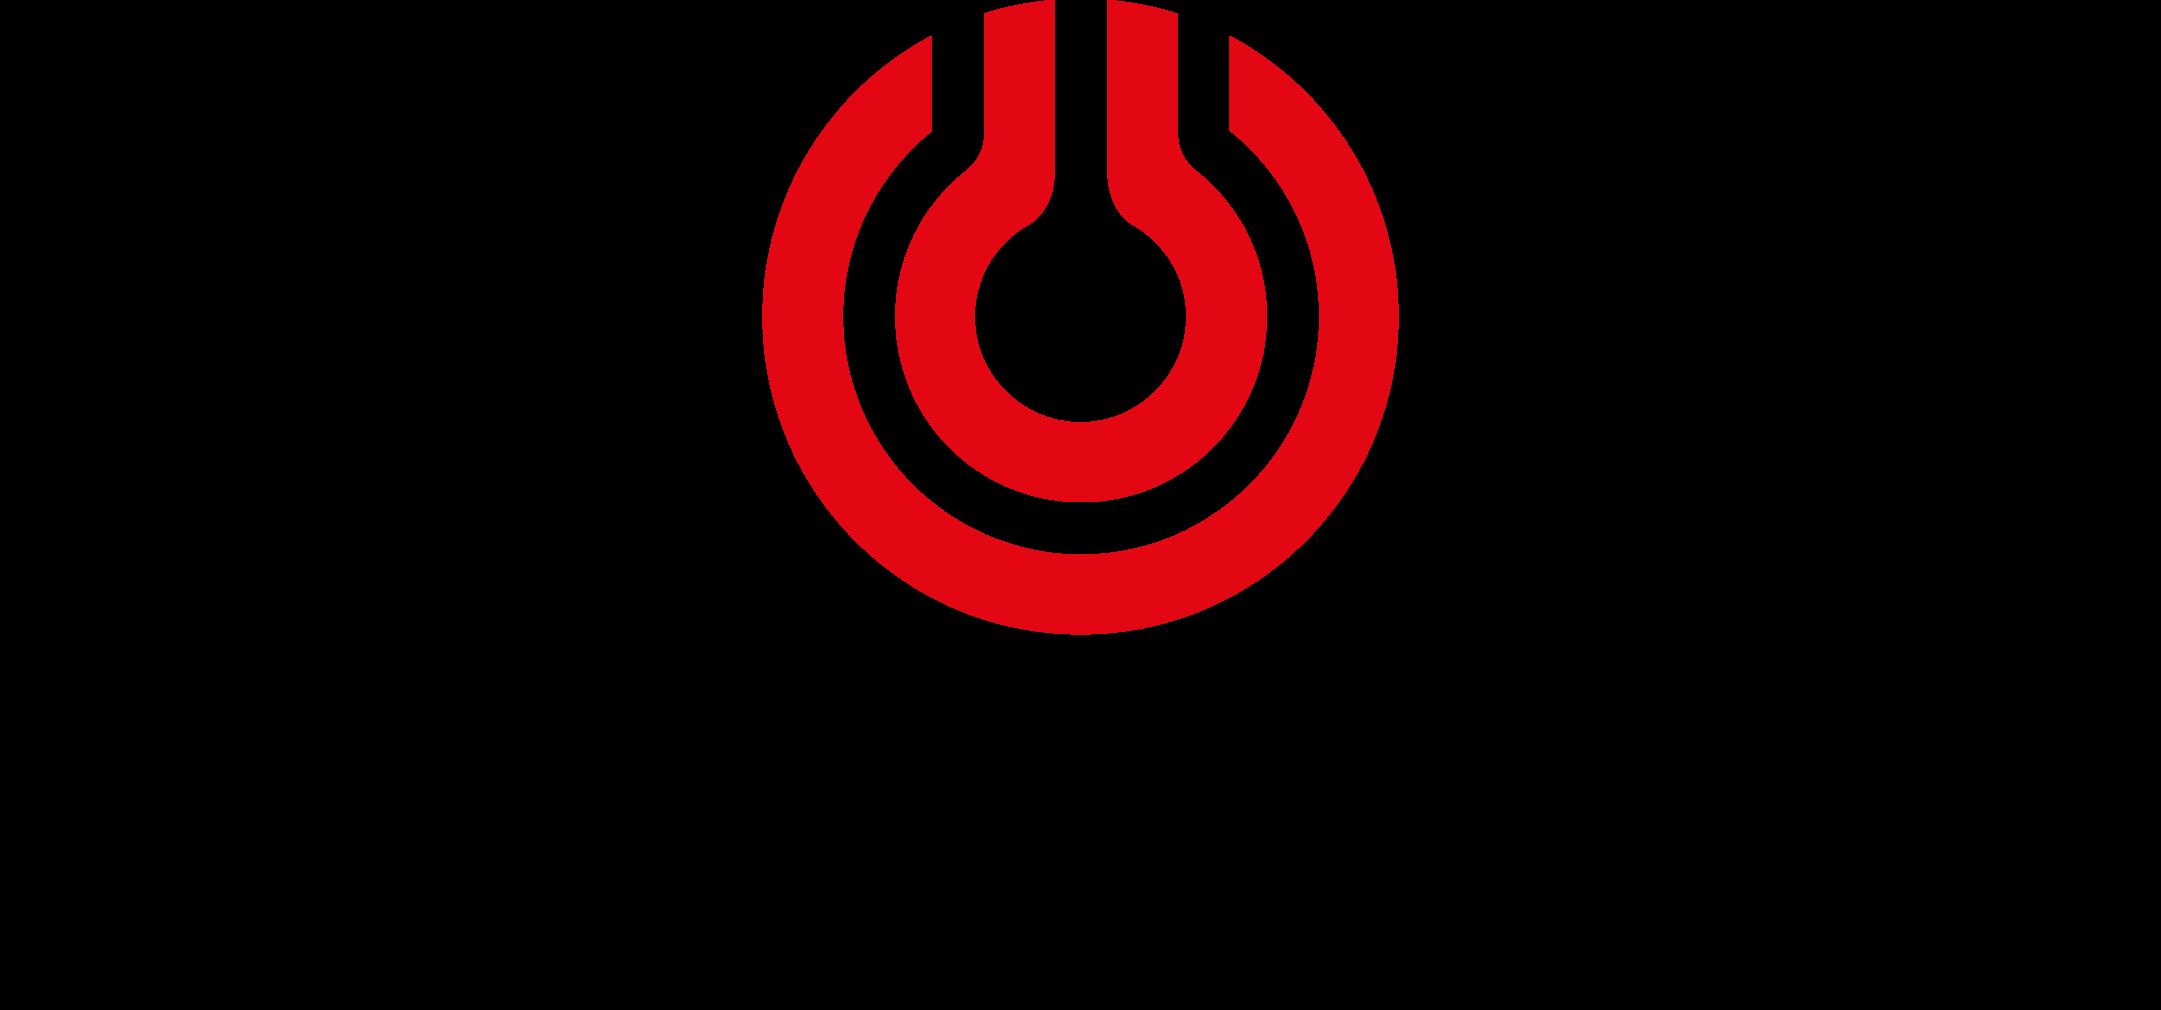 shv energy logo 1 - SHV Energy Logo